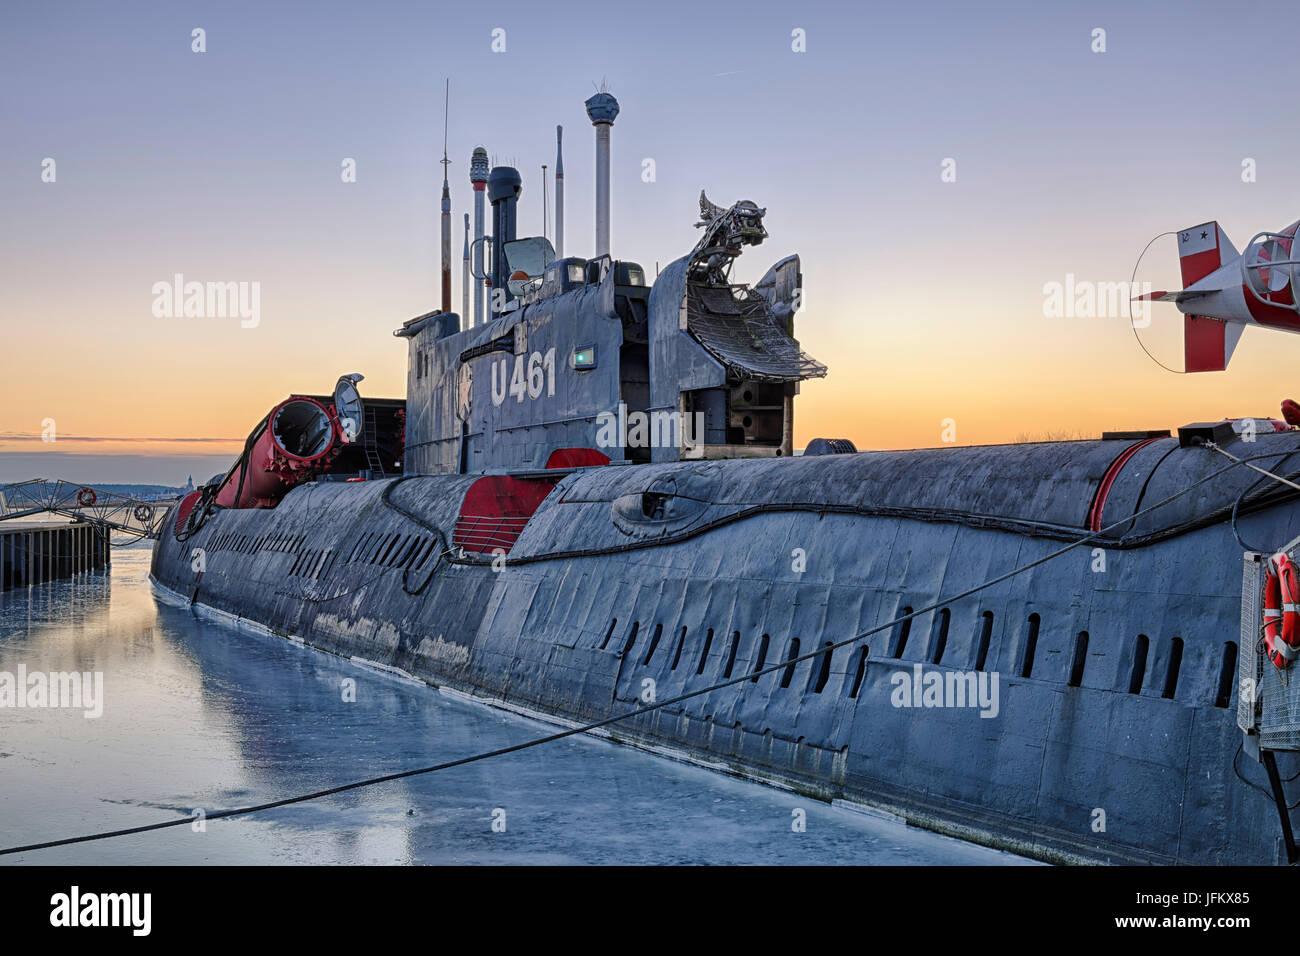 Submarine, U-461, Maritime Museum, Peenemünde, Usedom, Mecklenburg-Western Pomerania, Germany - Stock Image